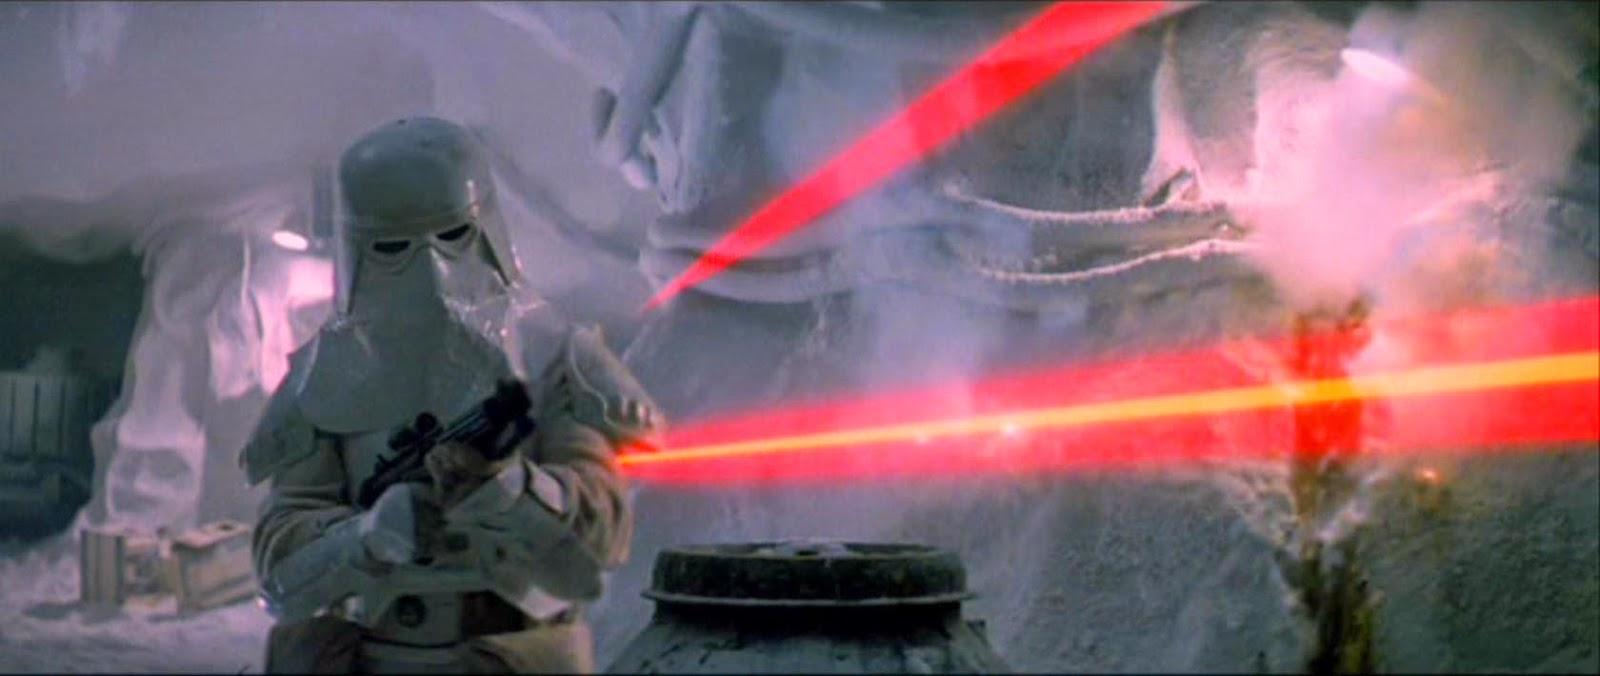 5 inventions de star wars qui existent aujourd'hui